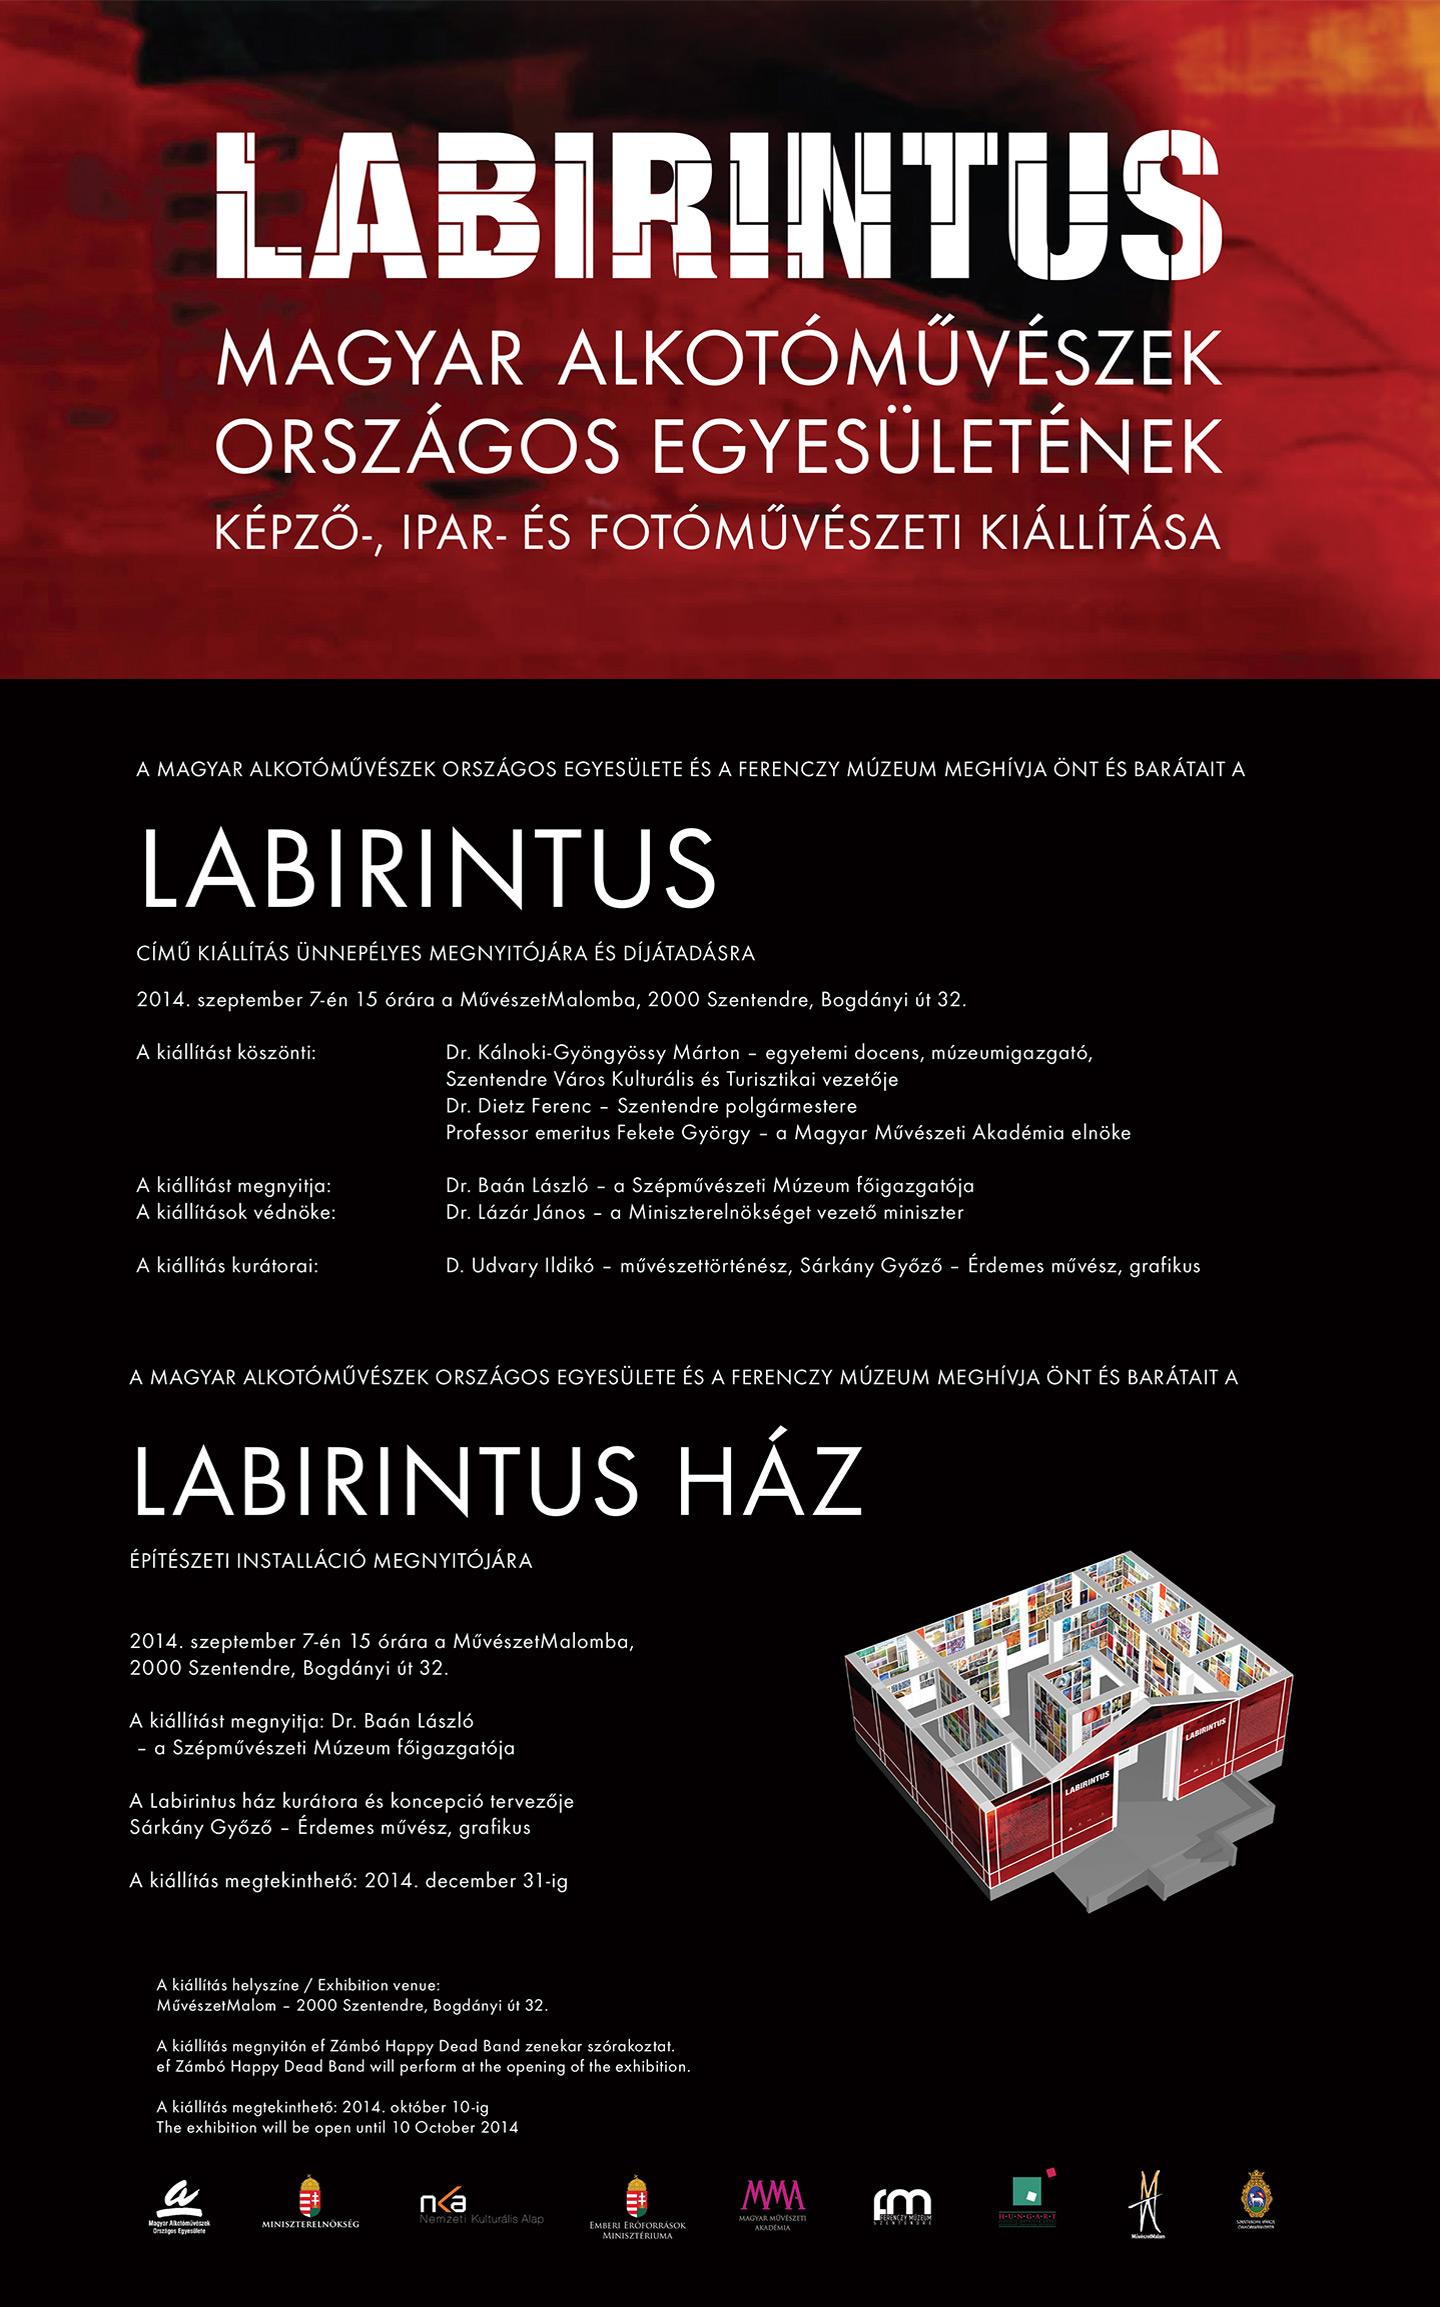 015_labirintus